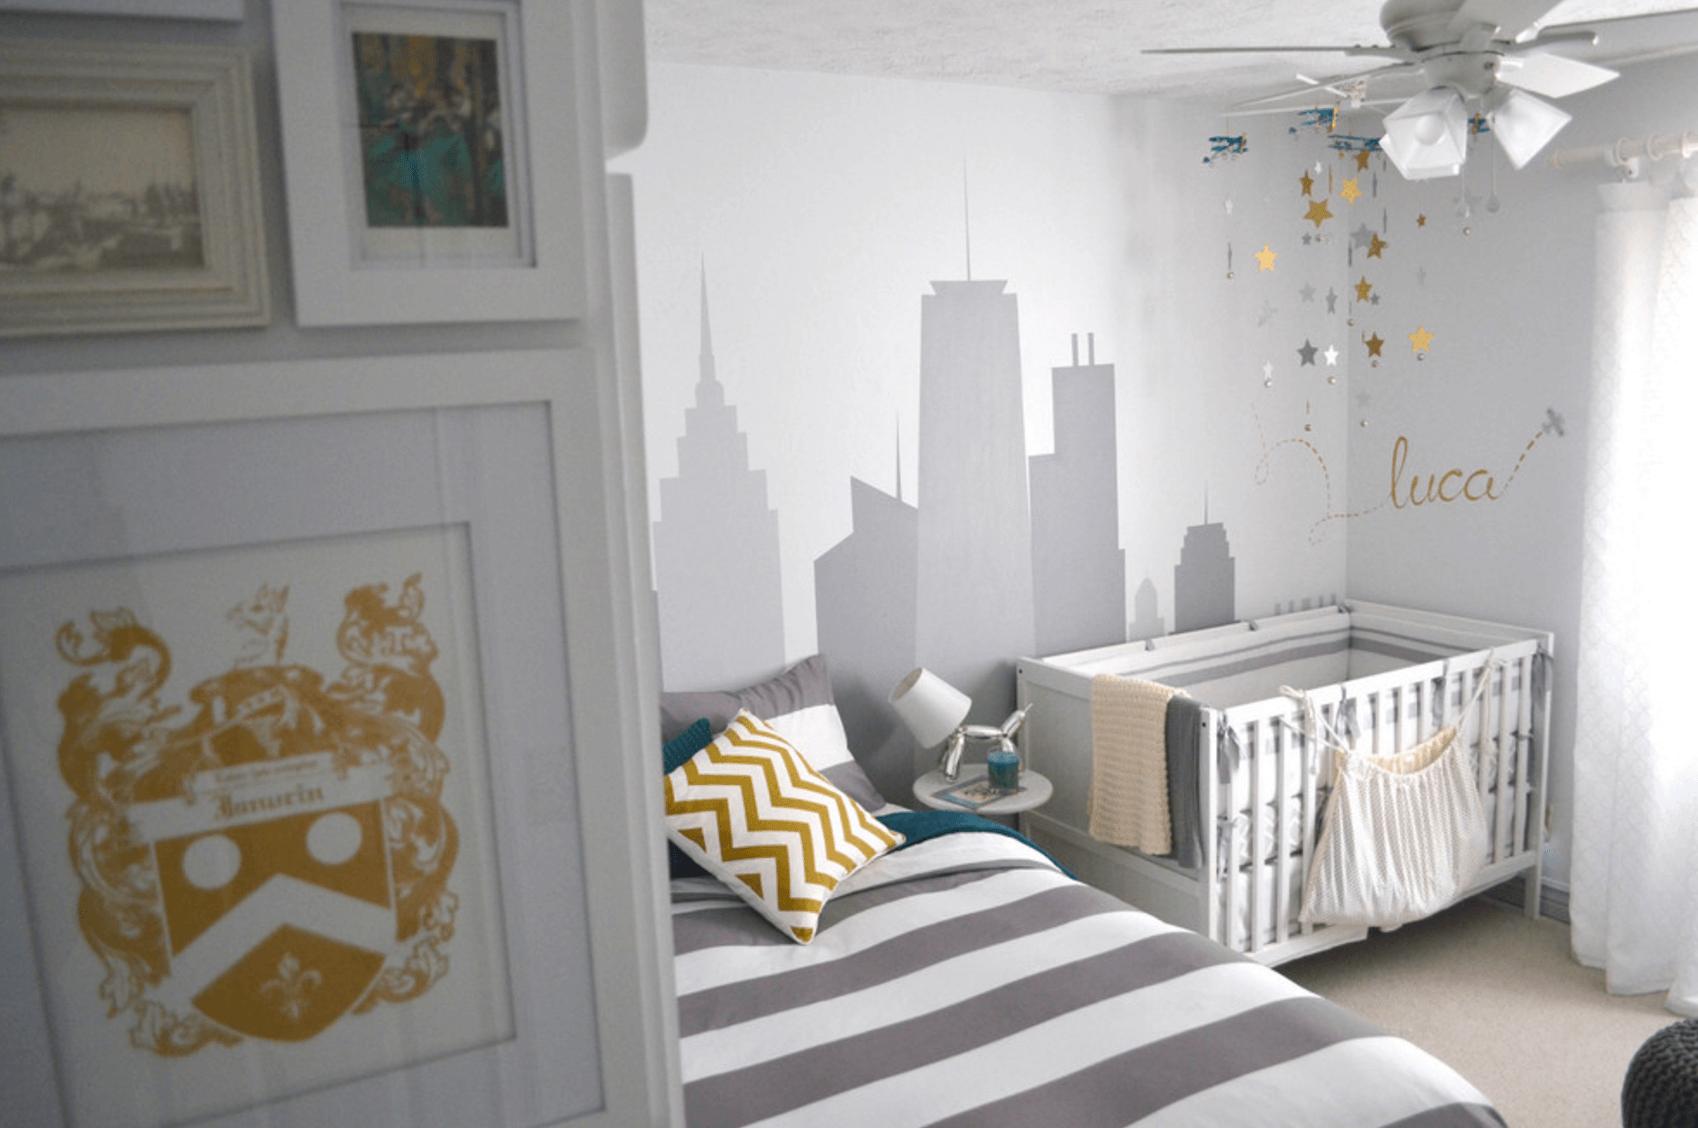 Detská izba je otázkou (nielen) fantázie